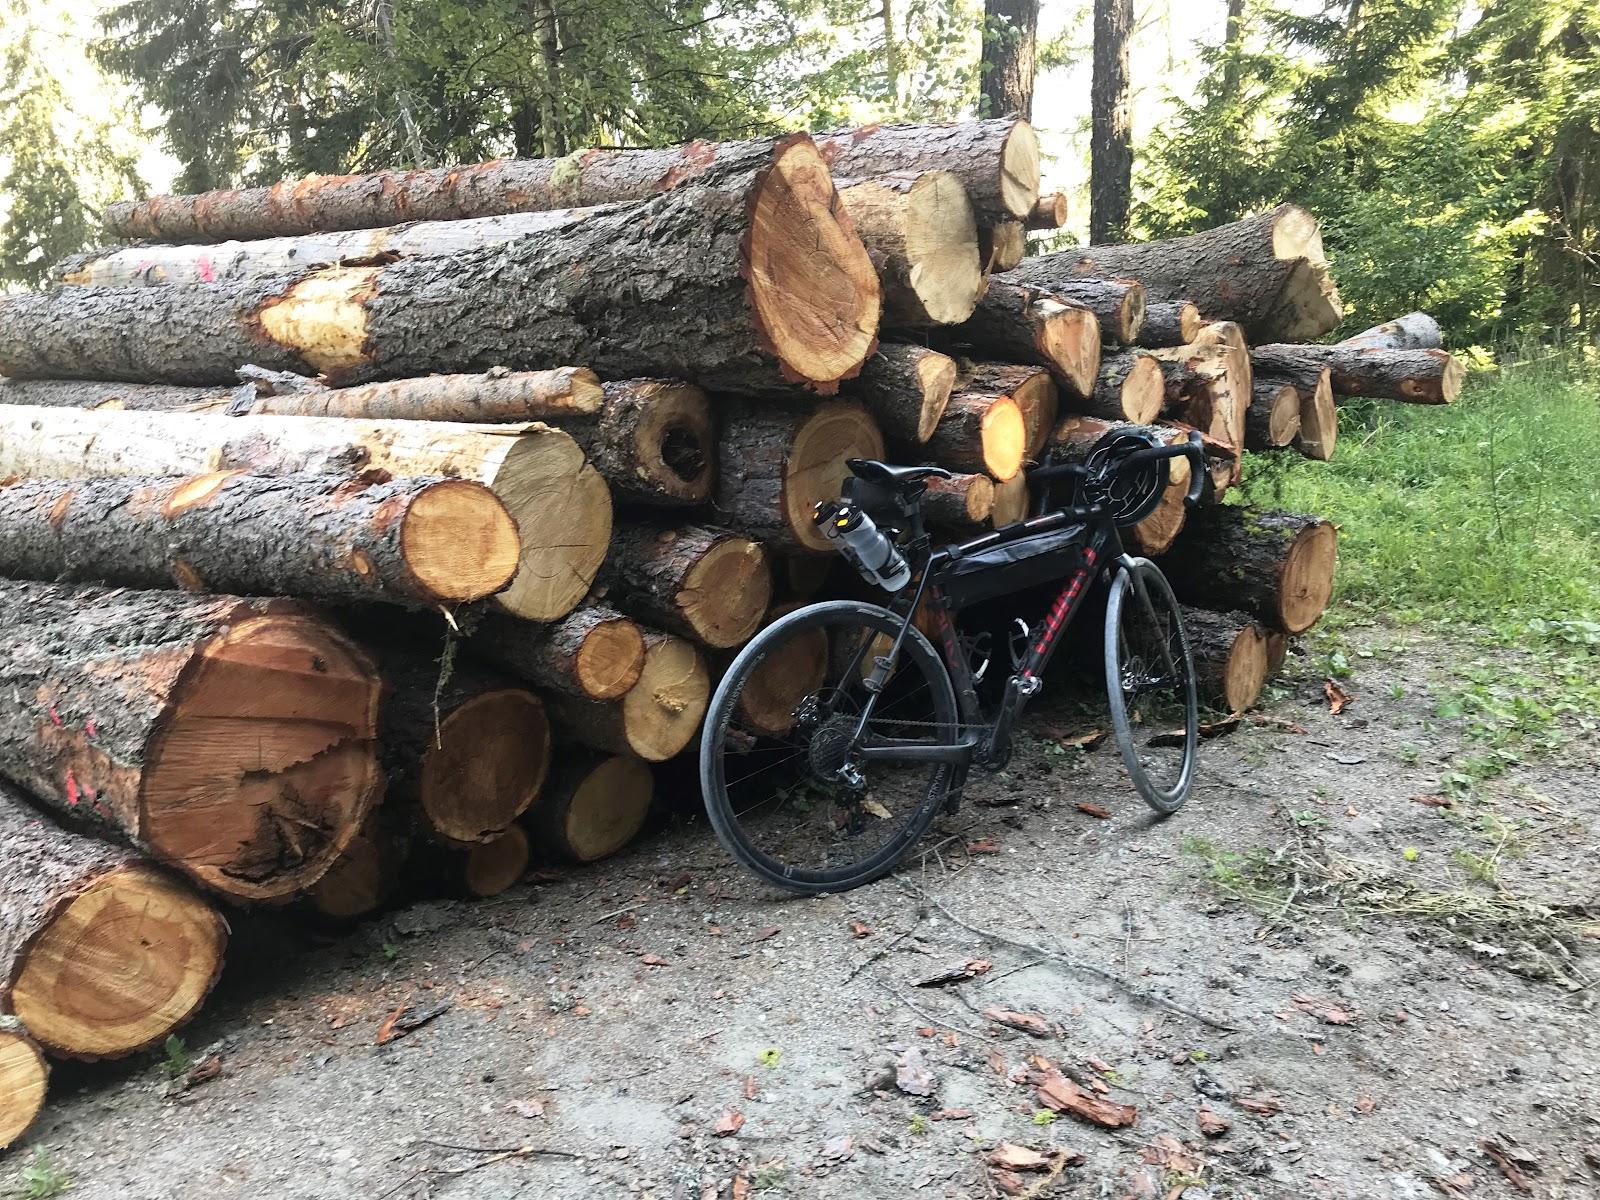 Bicycle ride Breithorn - log pile and bike